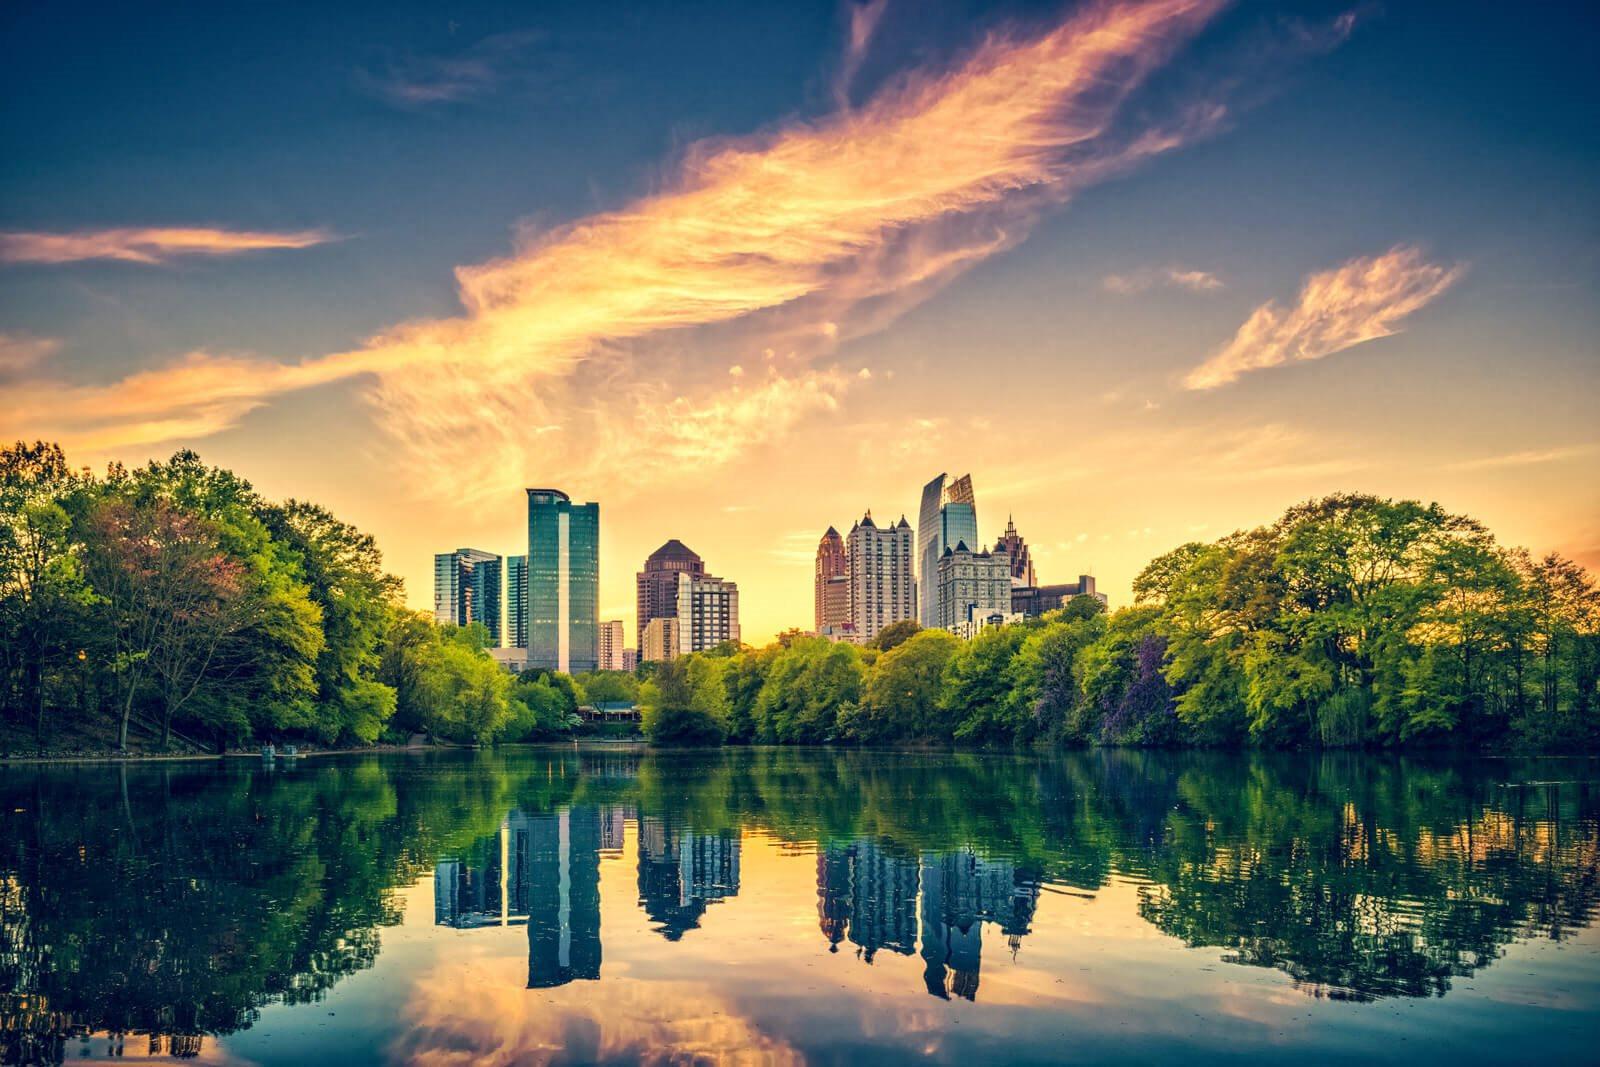 Atlanta Skyline from Piedmont Park near Windsor Old Fourth Ward, 608 Ralph McGill Blvd NE, Atlanta